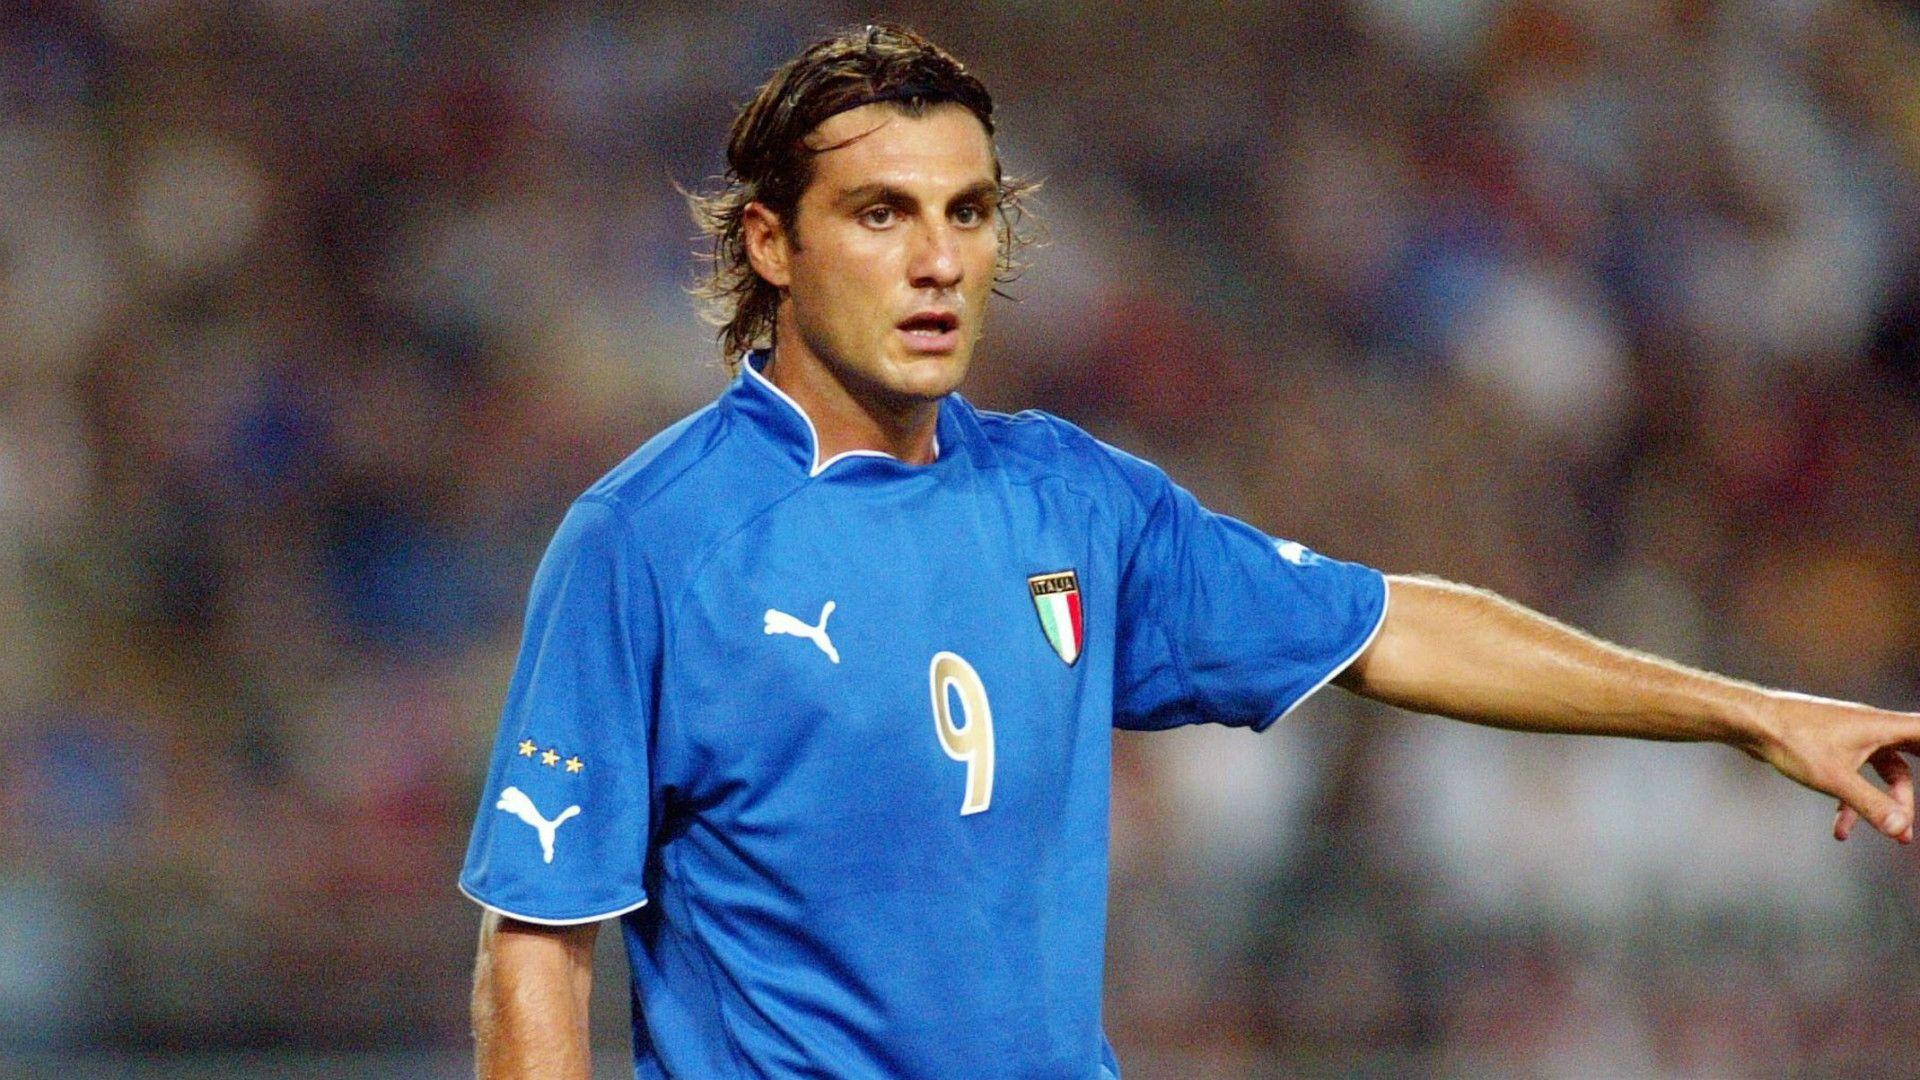 FIGC Christian Vieri 9ine Italy Pinterest